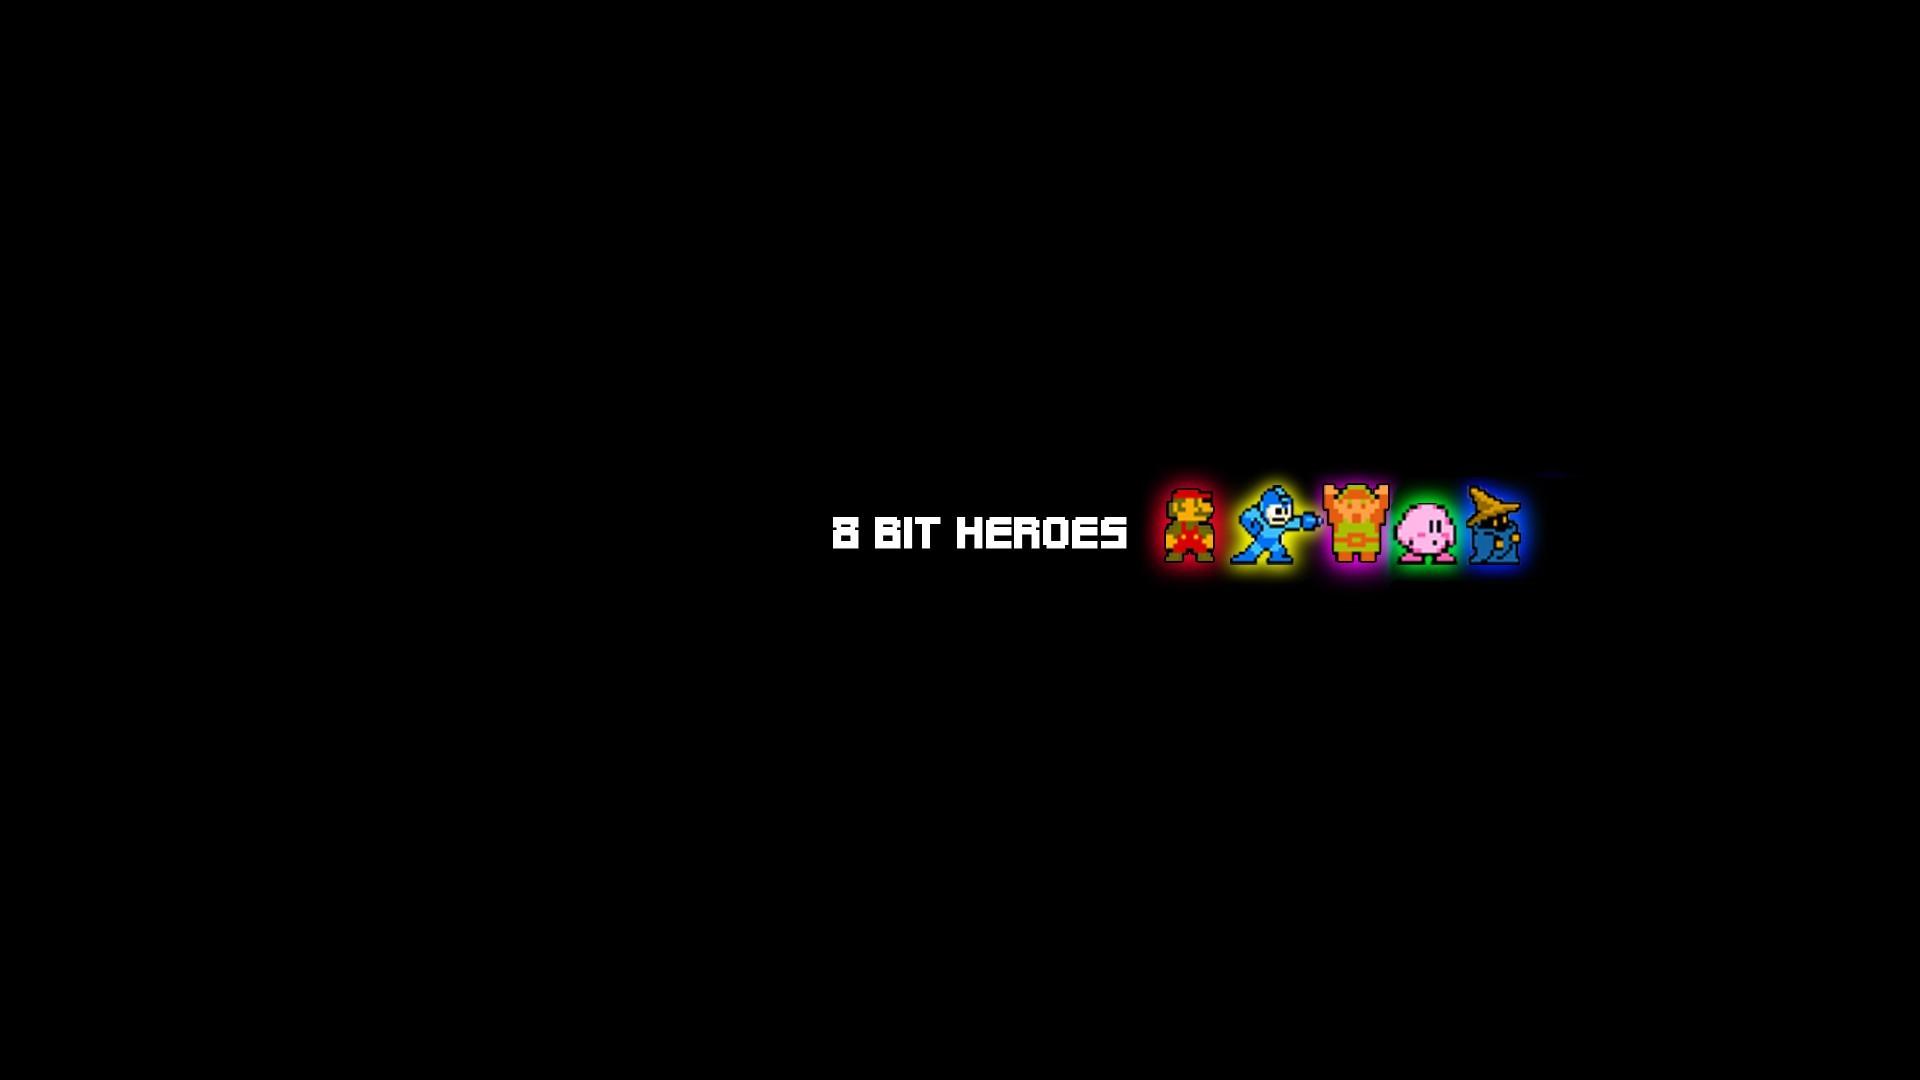 General 8-bit Super Mario minimalism The Legend of Zelda Mega Man  Kirby Link